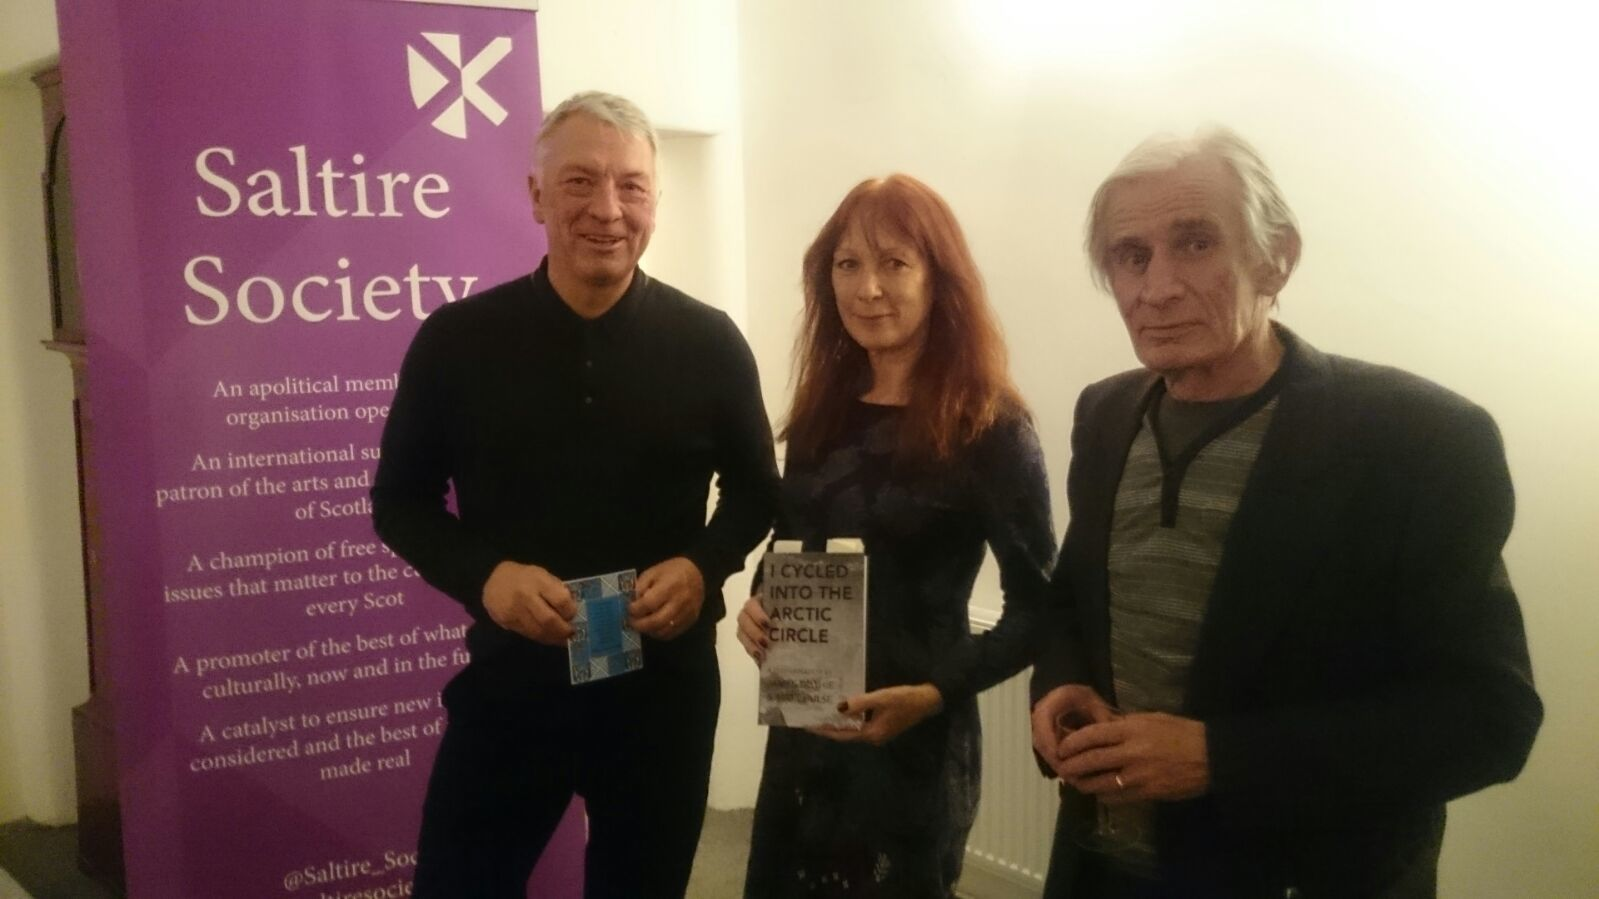 Saltire Society Executive Director Jim Tough, poetry read by Anna Tessier-Lavigne, Dummy Jim contributing poet John Mackie